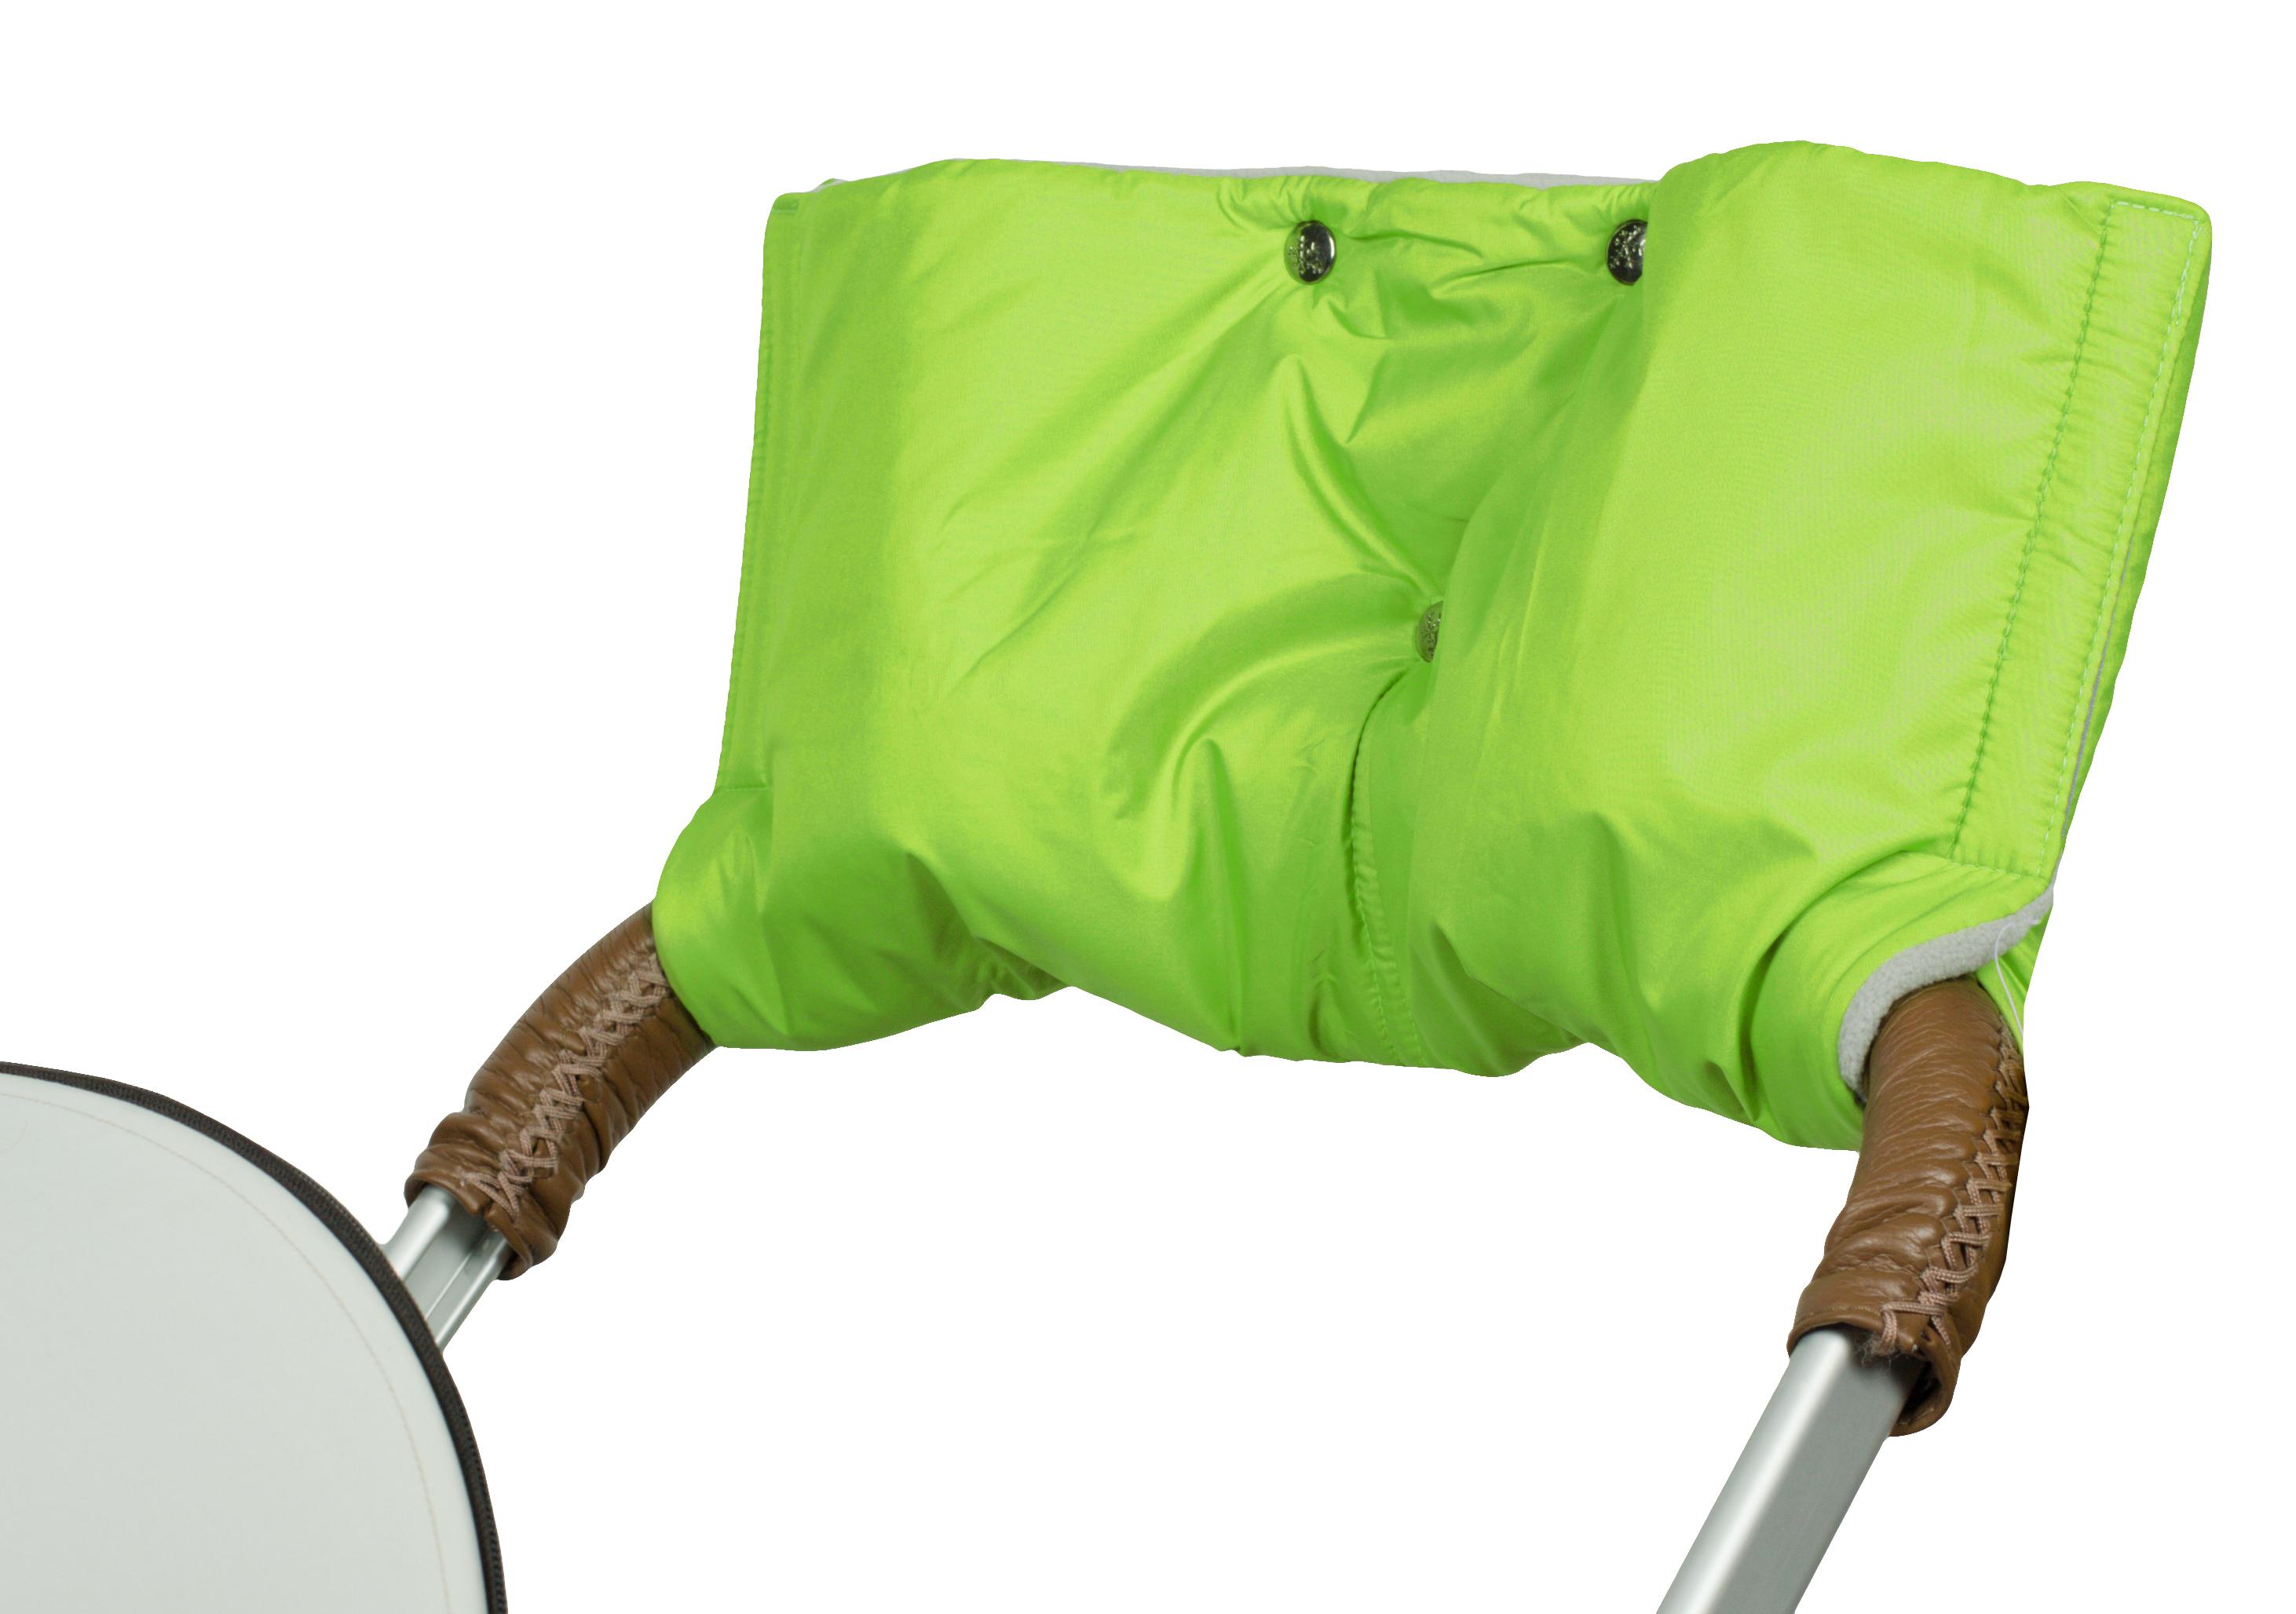 Аксессуар для колясок Чудо-Чадо Муфта для рук на коляску флисовая (на липучке), МКФ04-001 зеленый муфта для рук на коляску чудо чадо комфорт мкм22 001 ярко зеленый